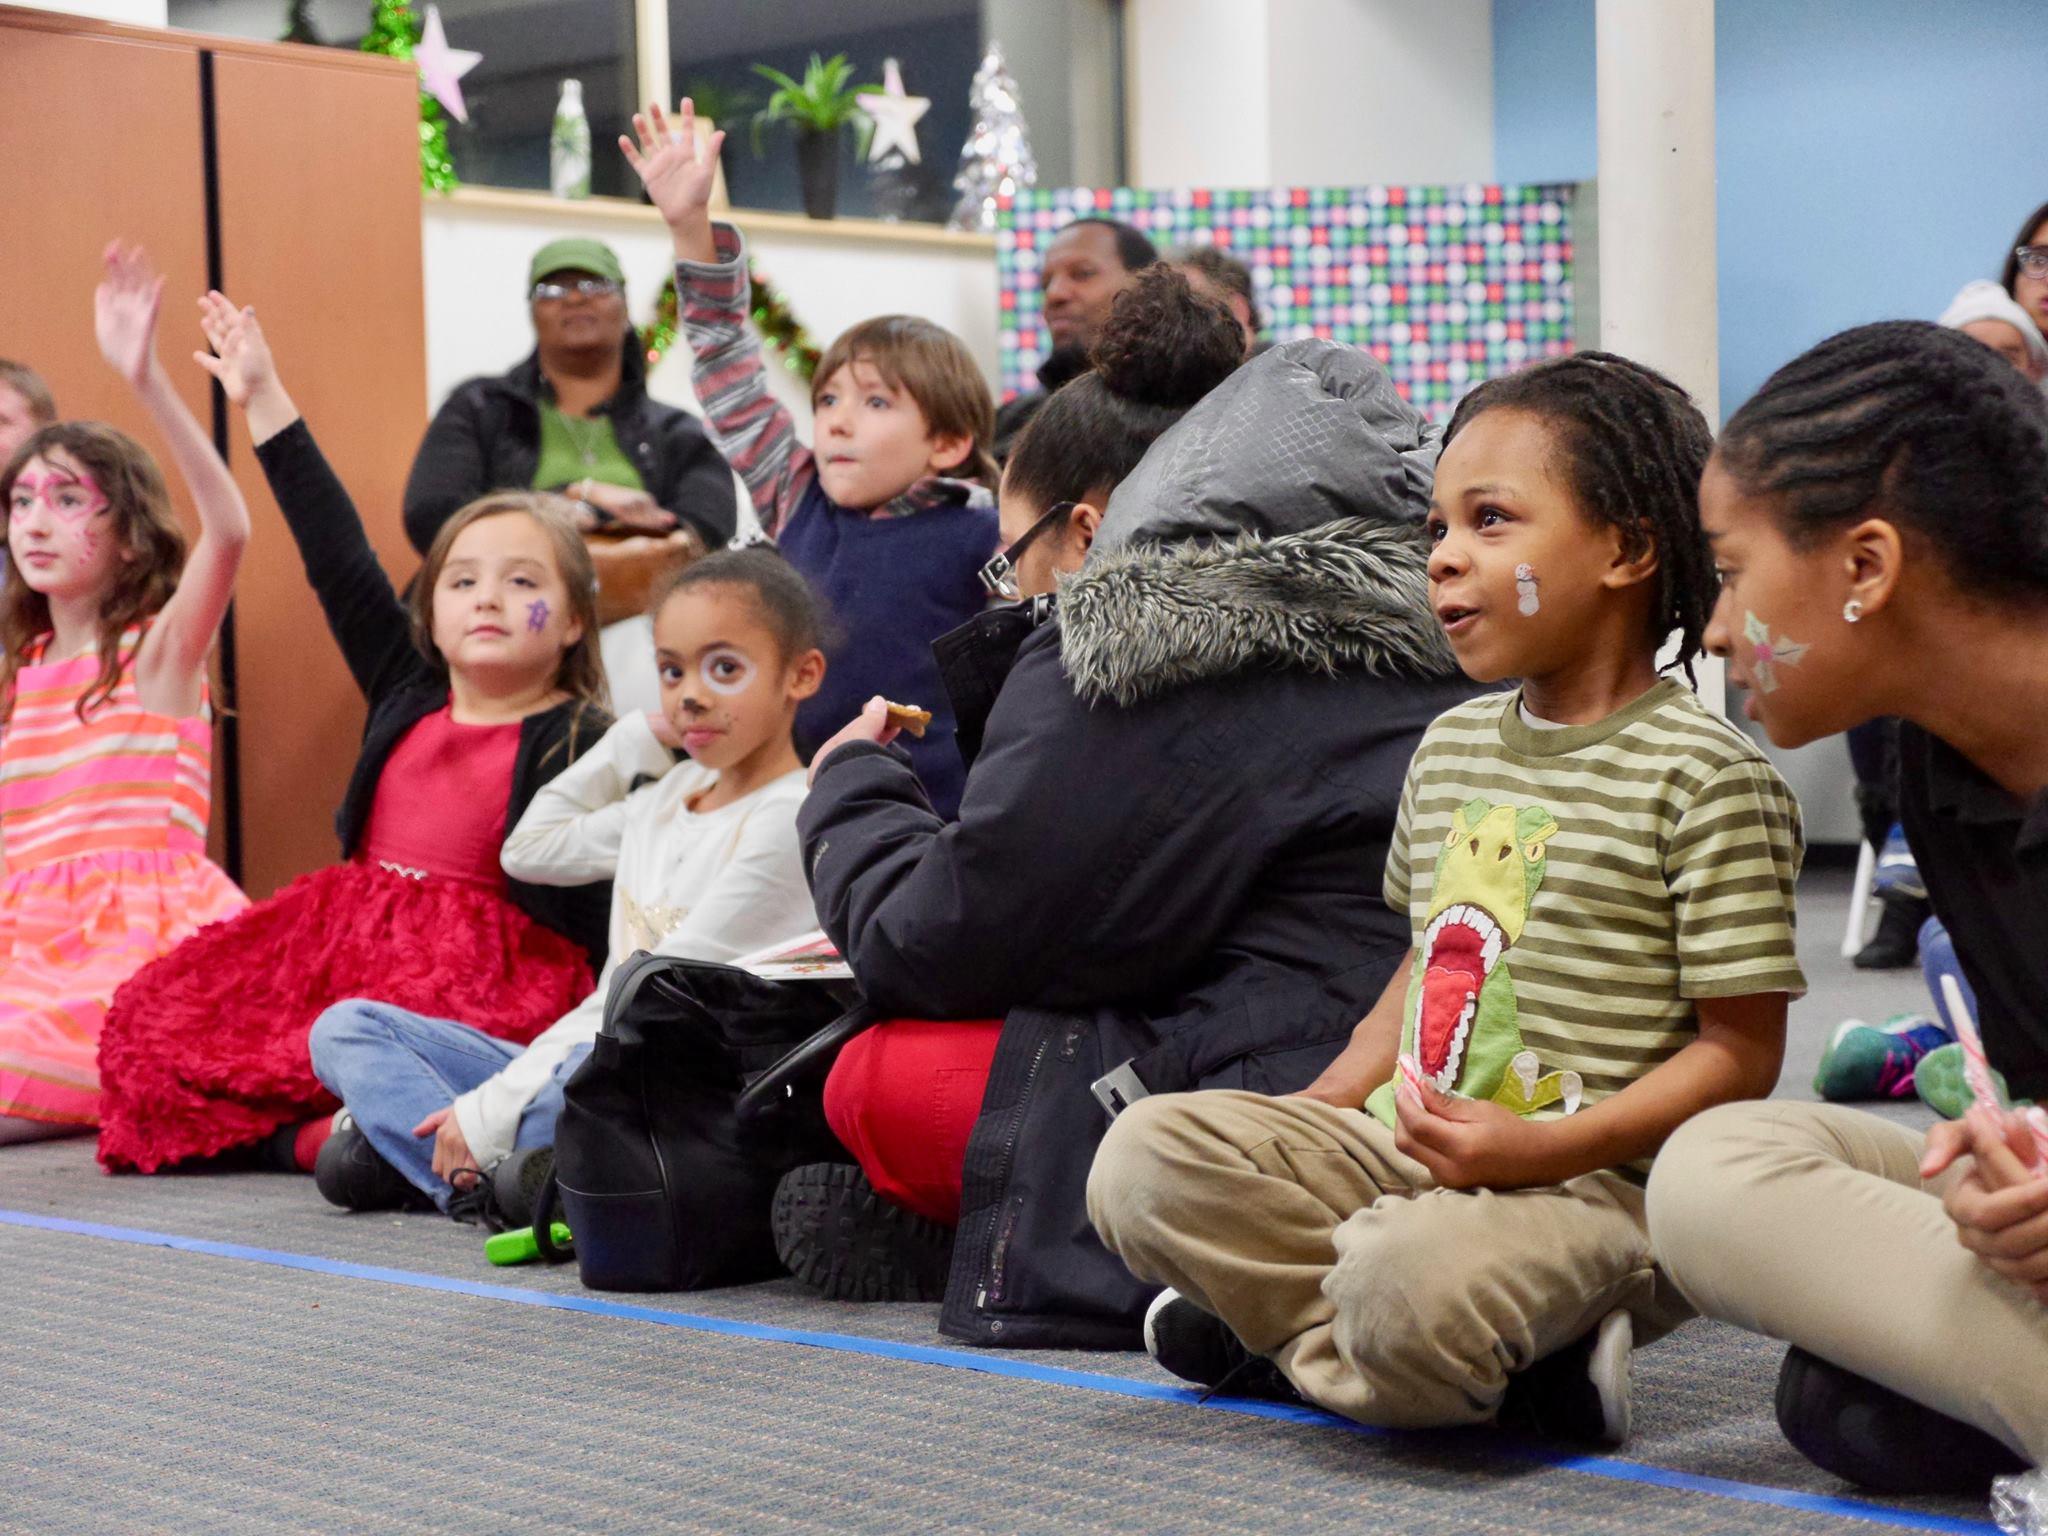 Parents and children sitting